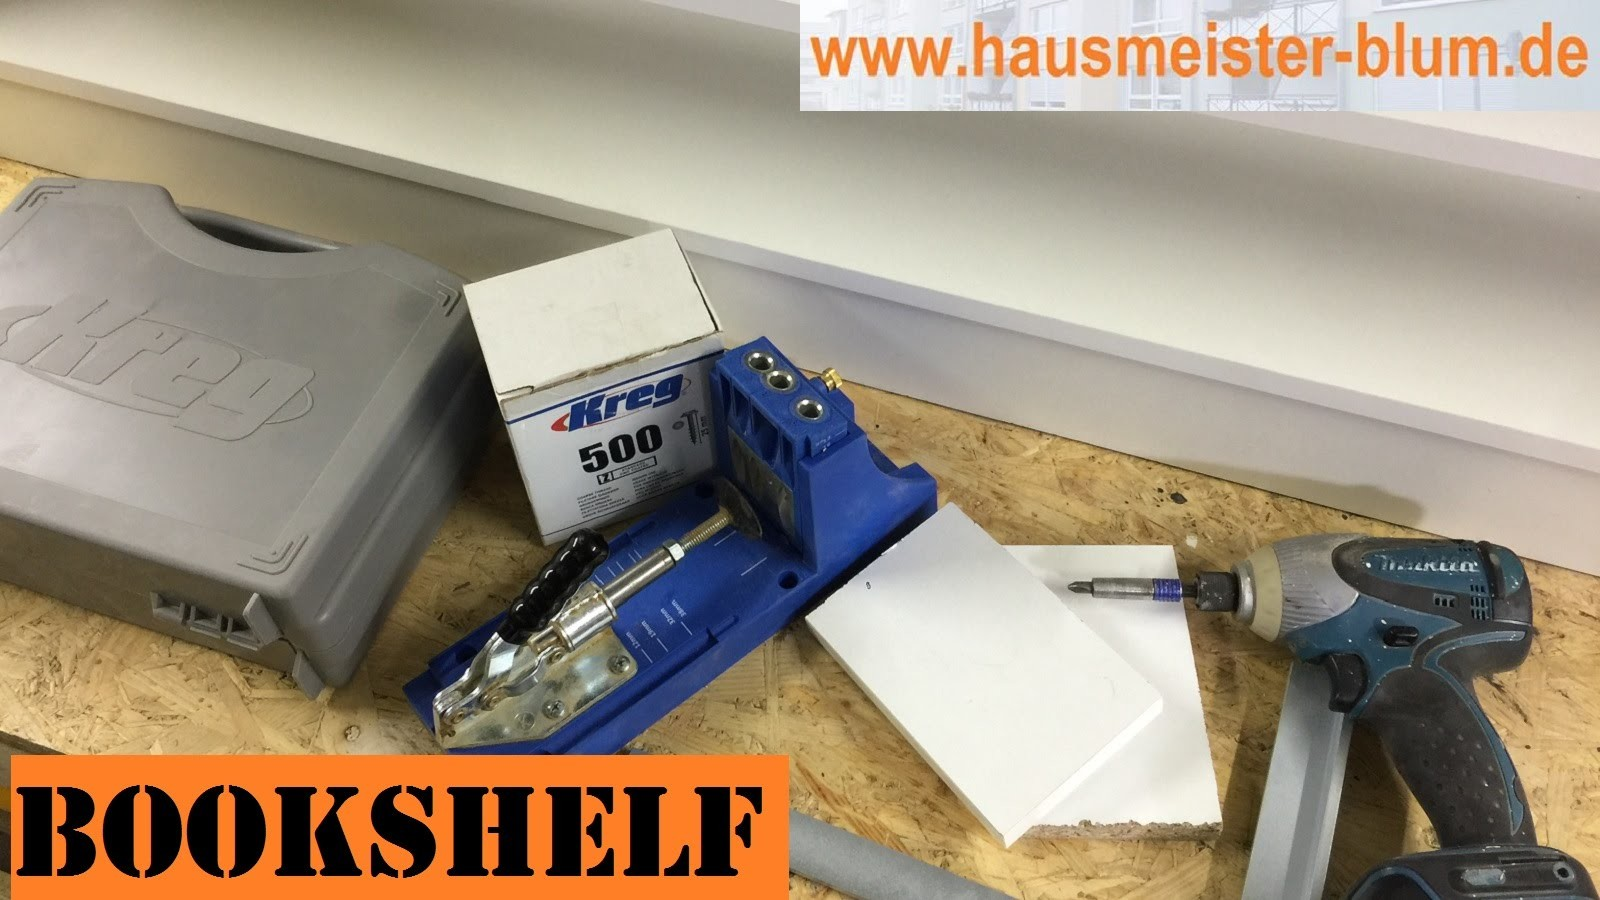 DIY: Regal [ Shelf build with Kreg Jig Pocket Hole Joinery System ]